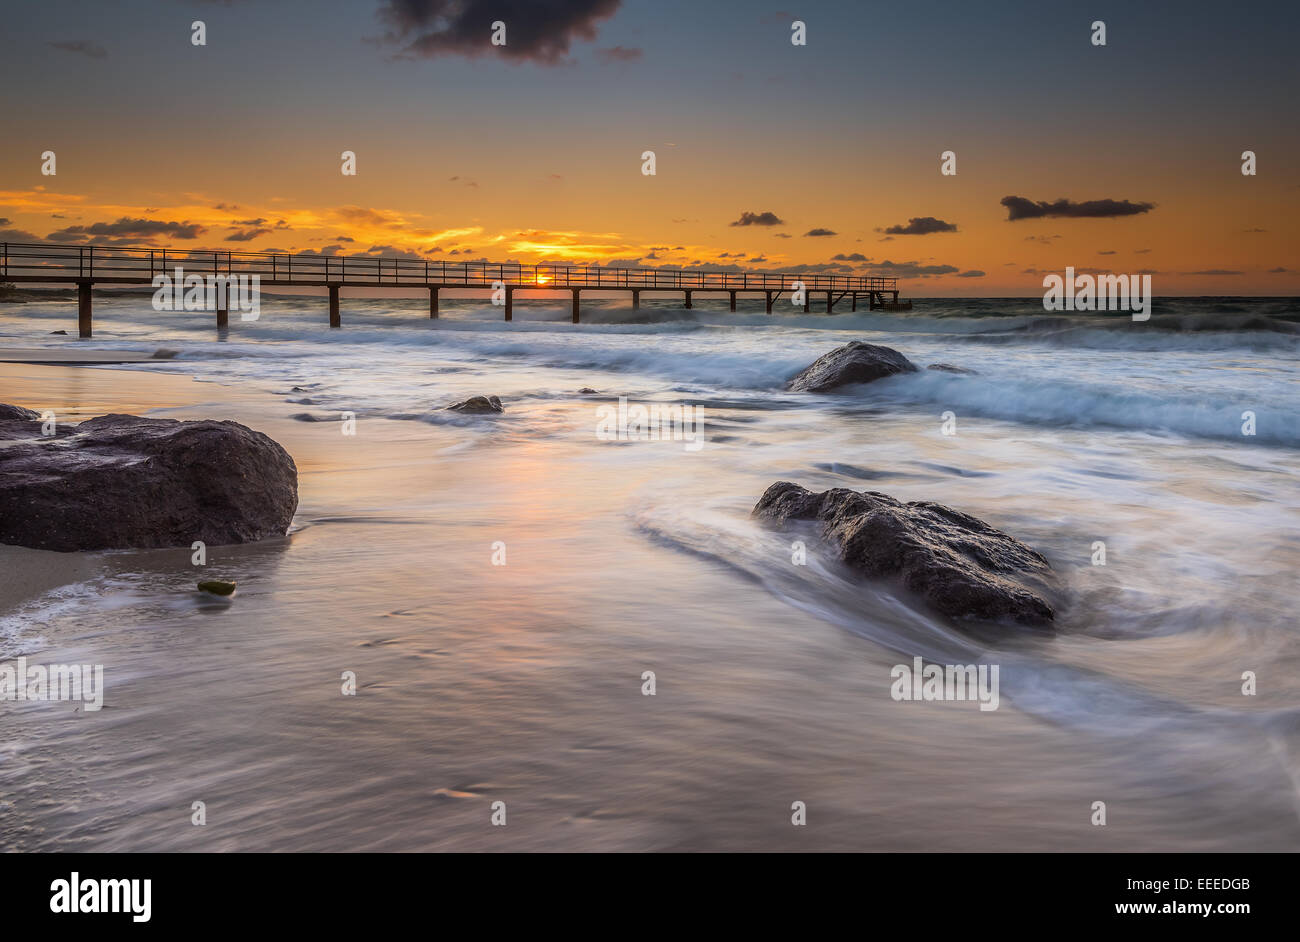 Sunset in Mastichari beach in Kos island Greece - Stock Image